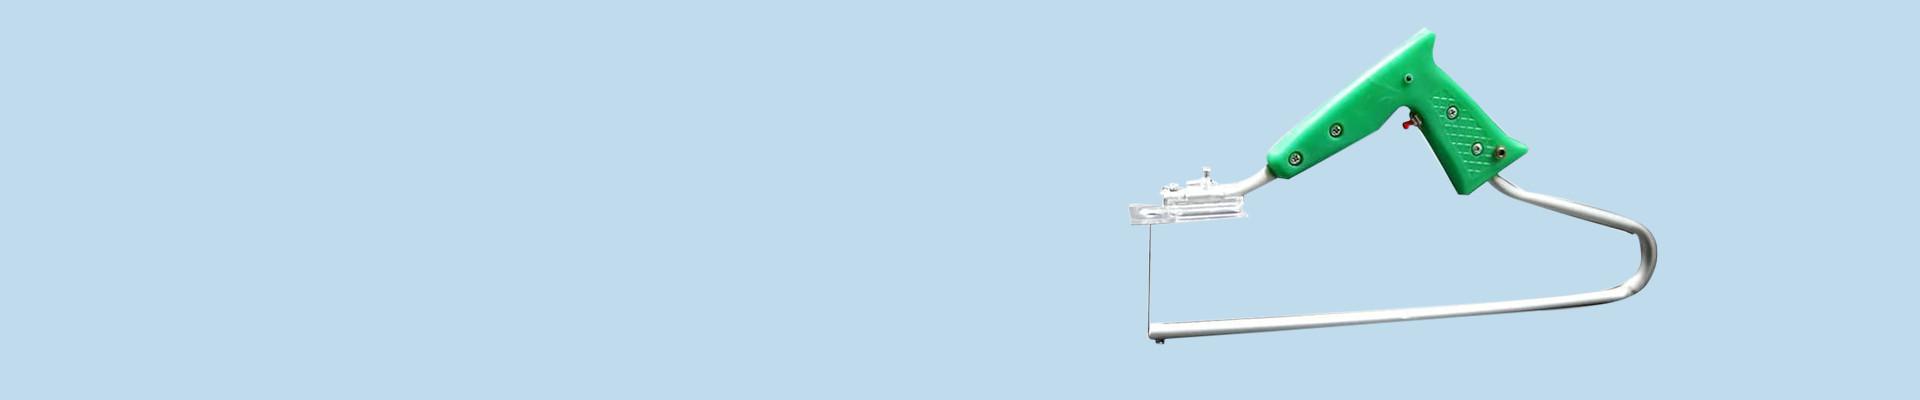 Jual Pemotong Styrofoam Terbaru - Harga Terbaik   Tokopedia